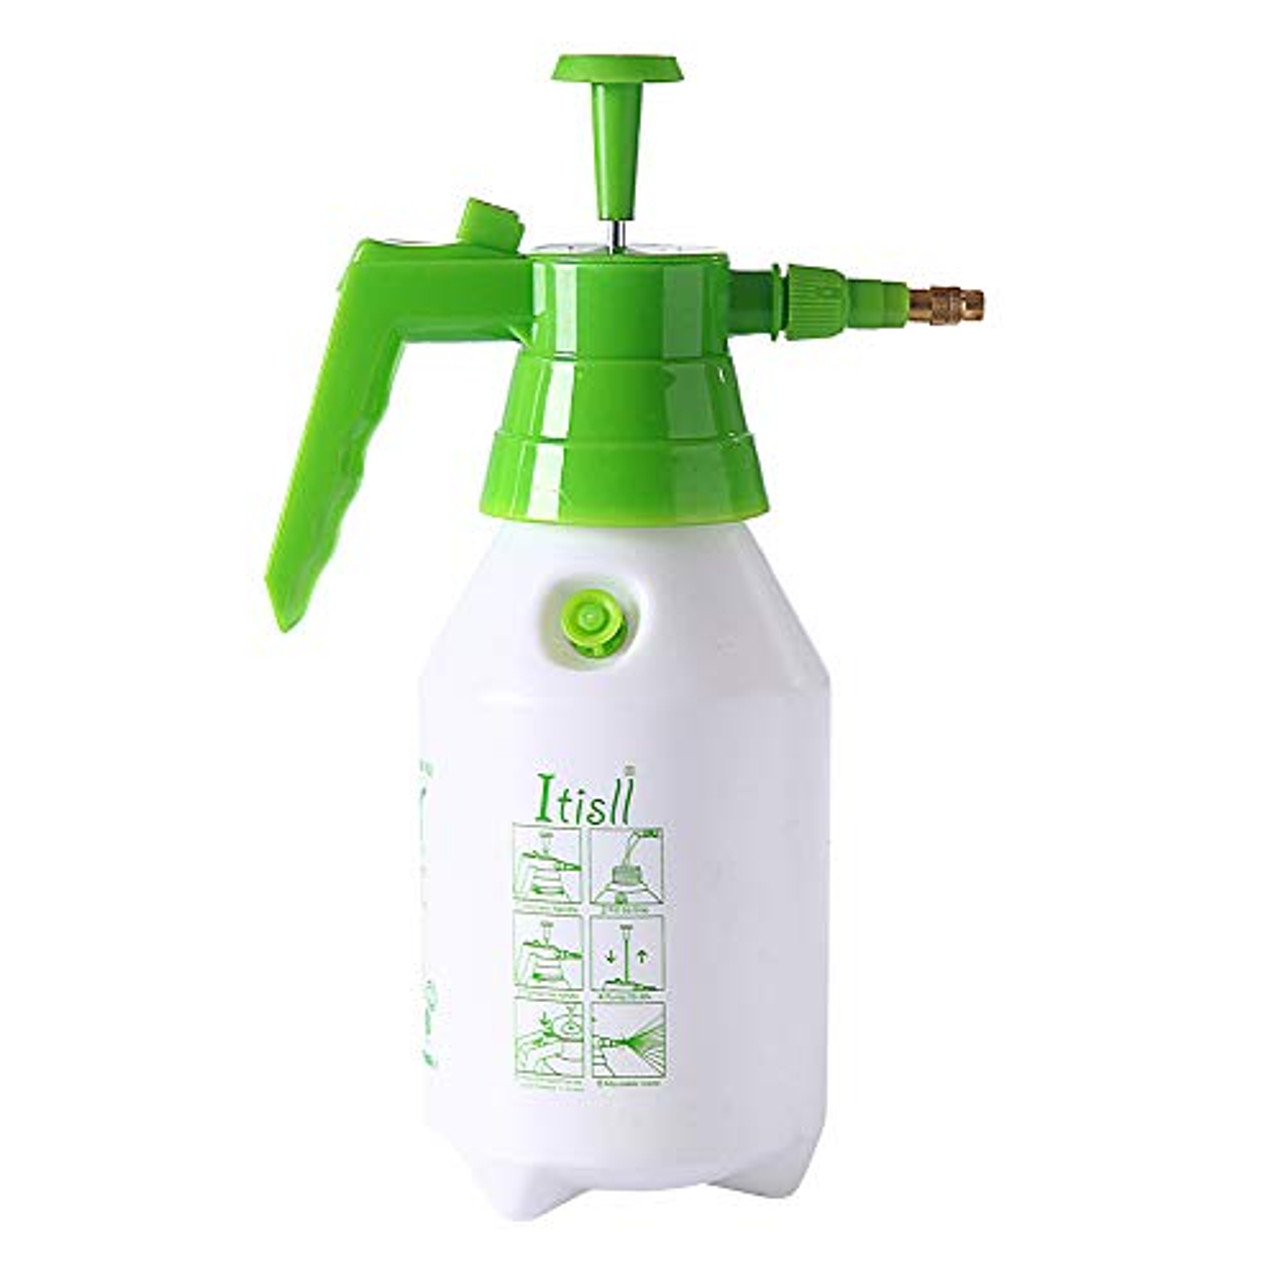 Manual Spray Bottle Adjustable Nozzle Hand Pressure Plastic Trigger Sprayers